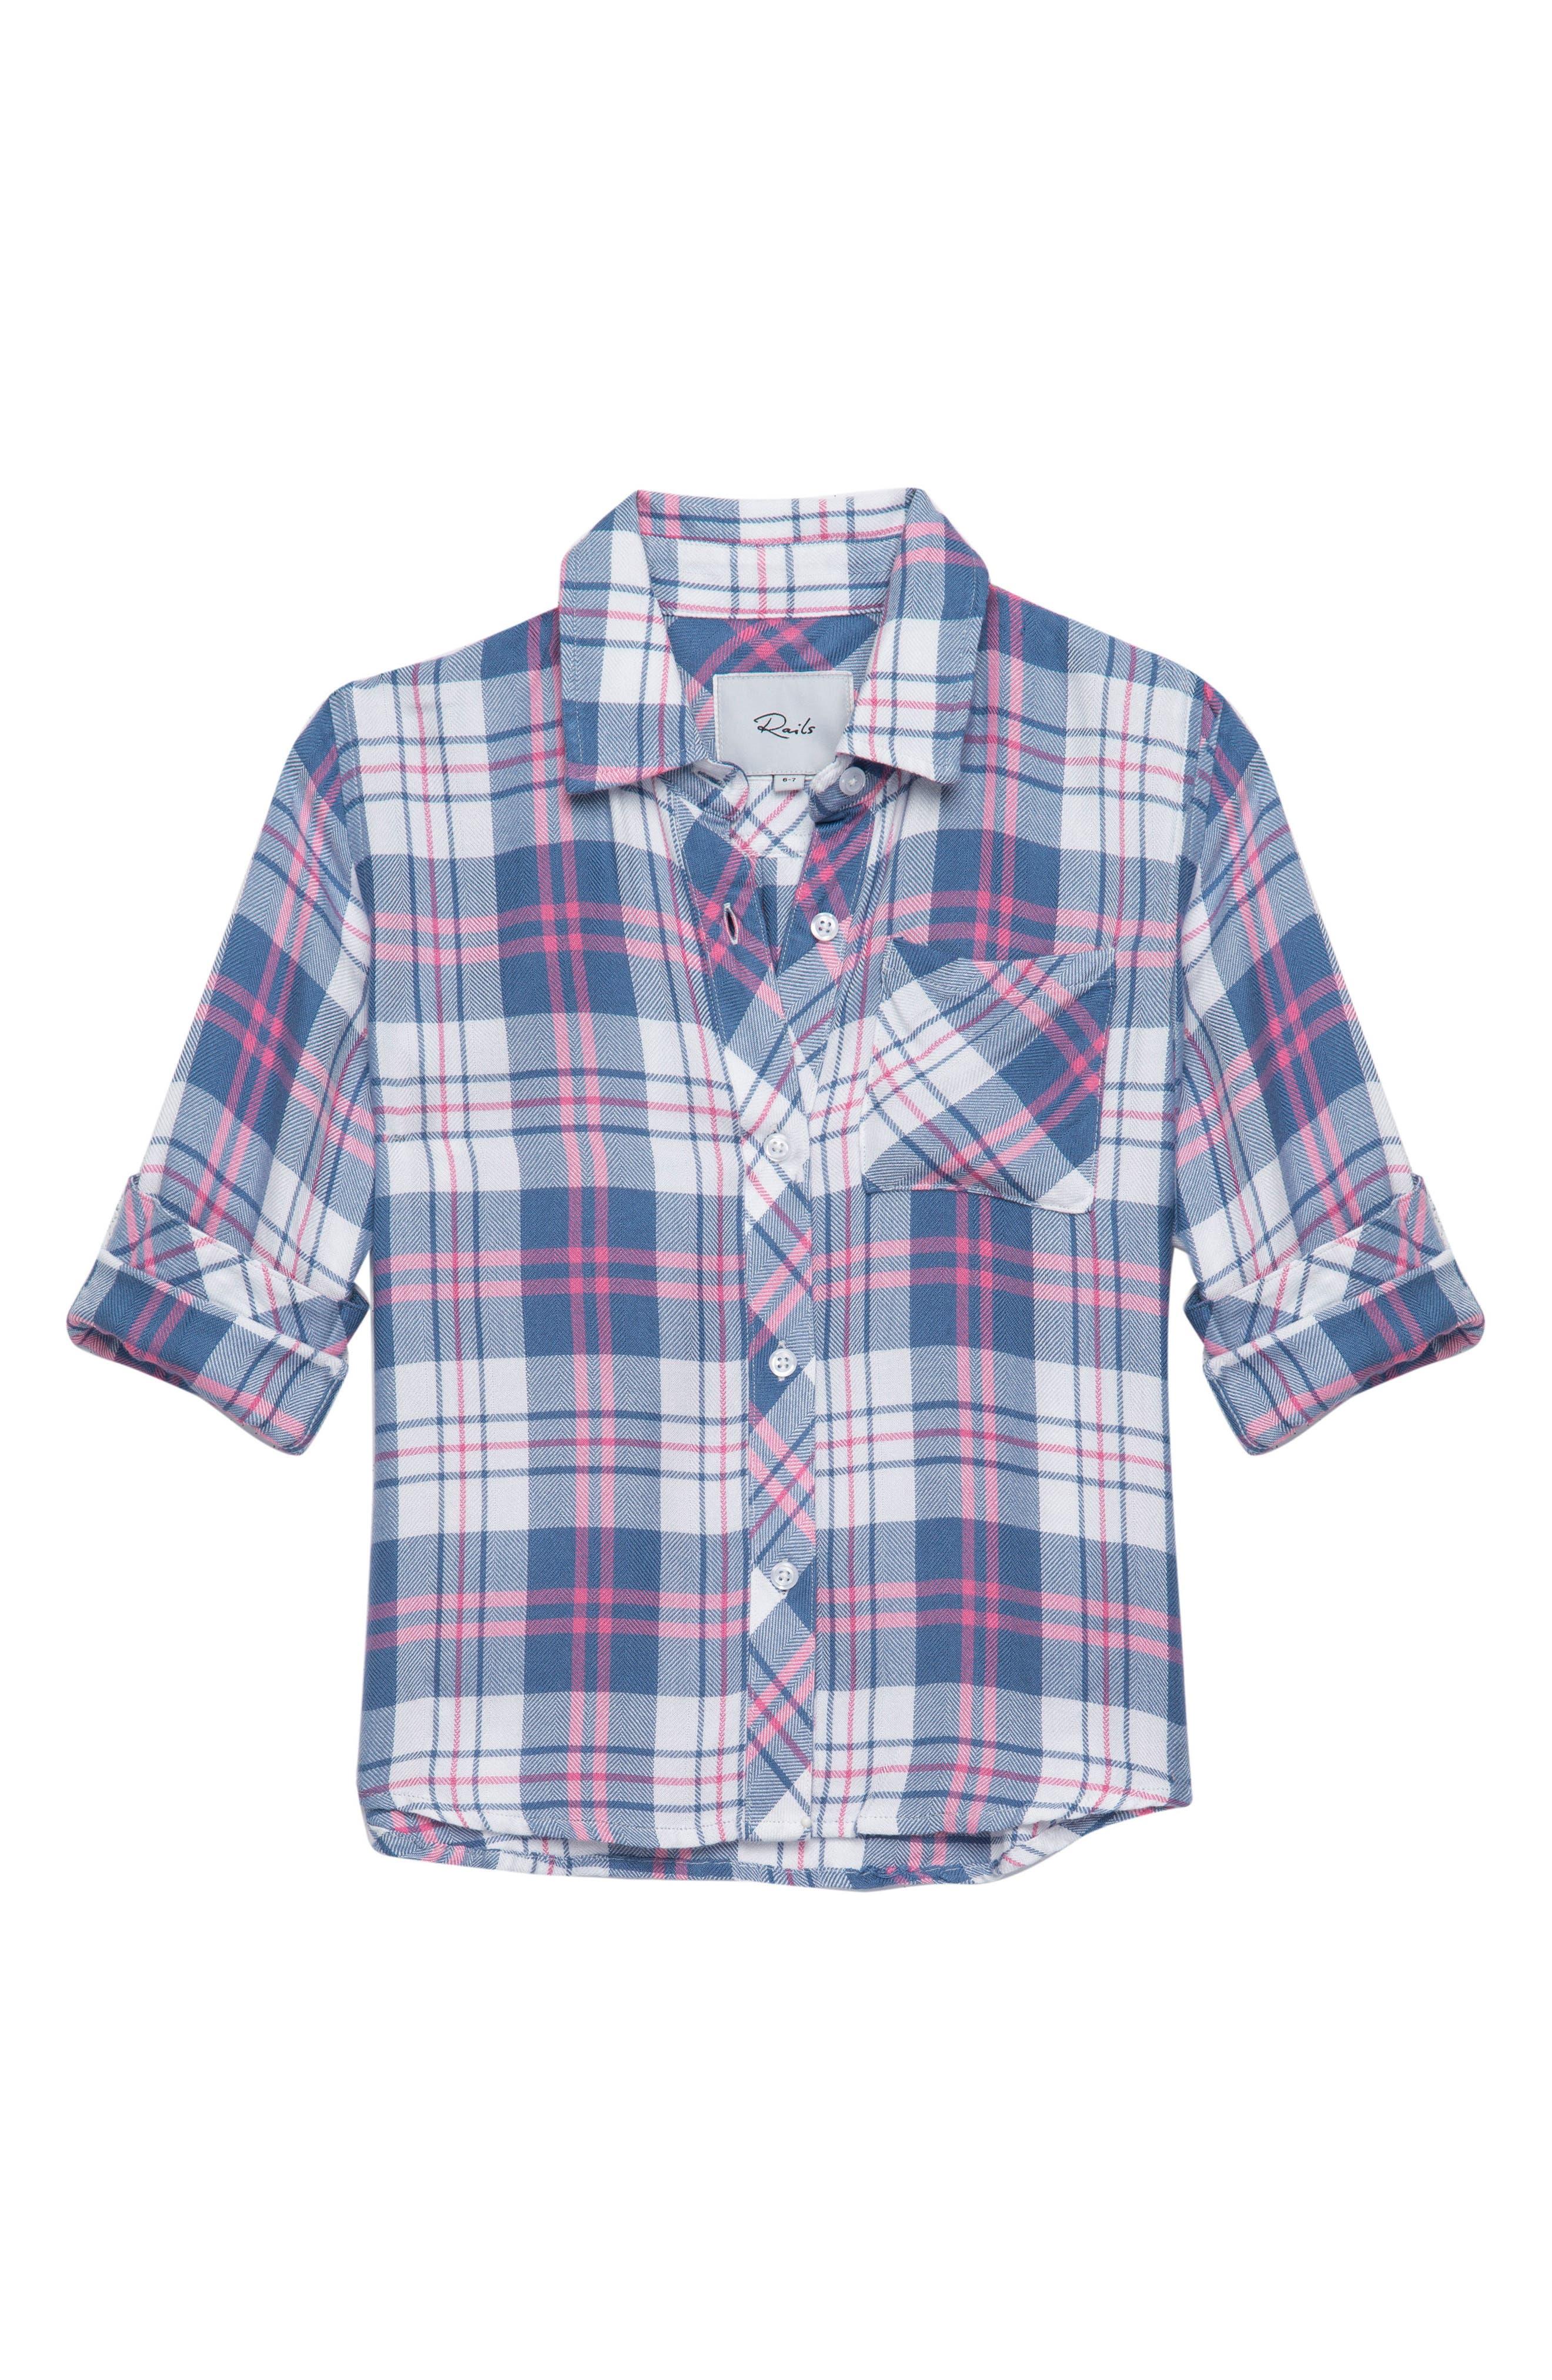 Hudson Plaid Shirt,                             Main thumbnail 1, color,                             100